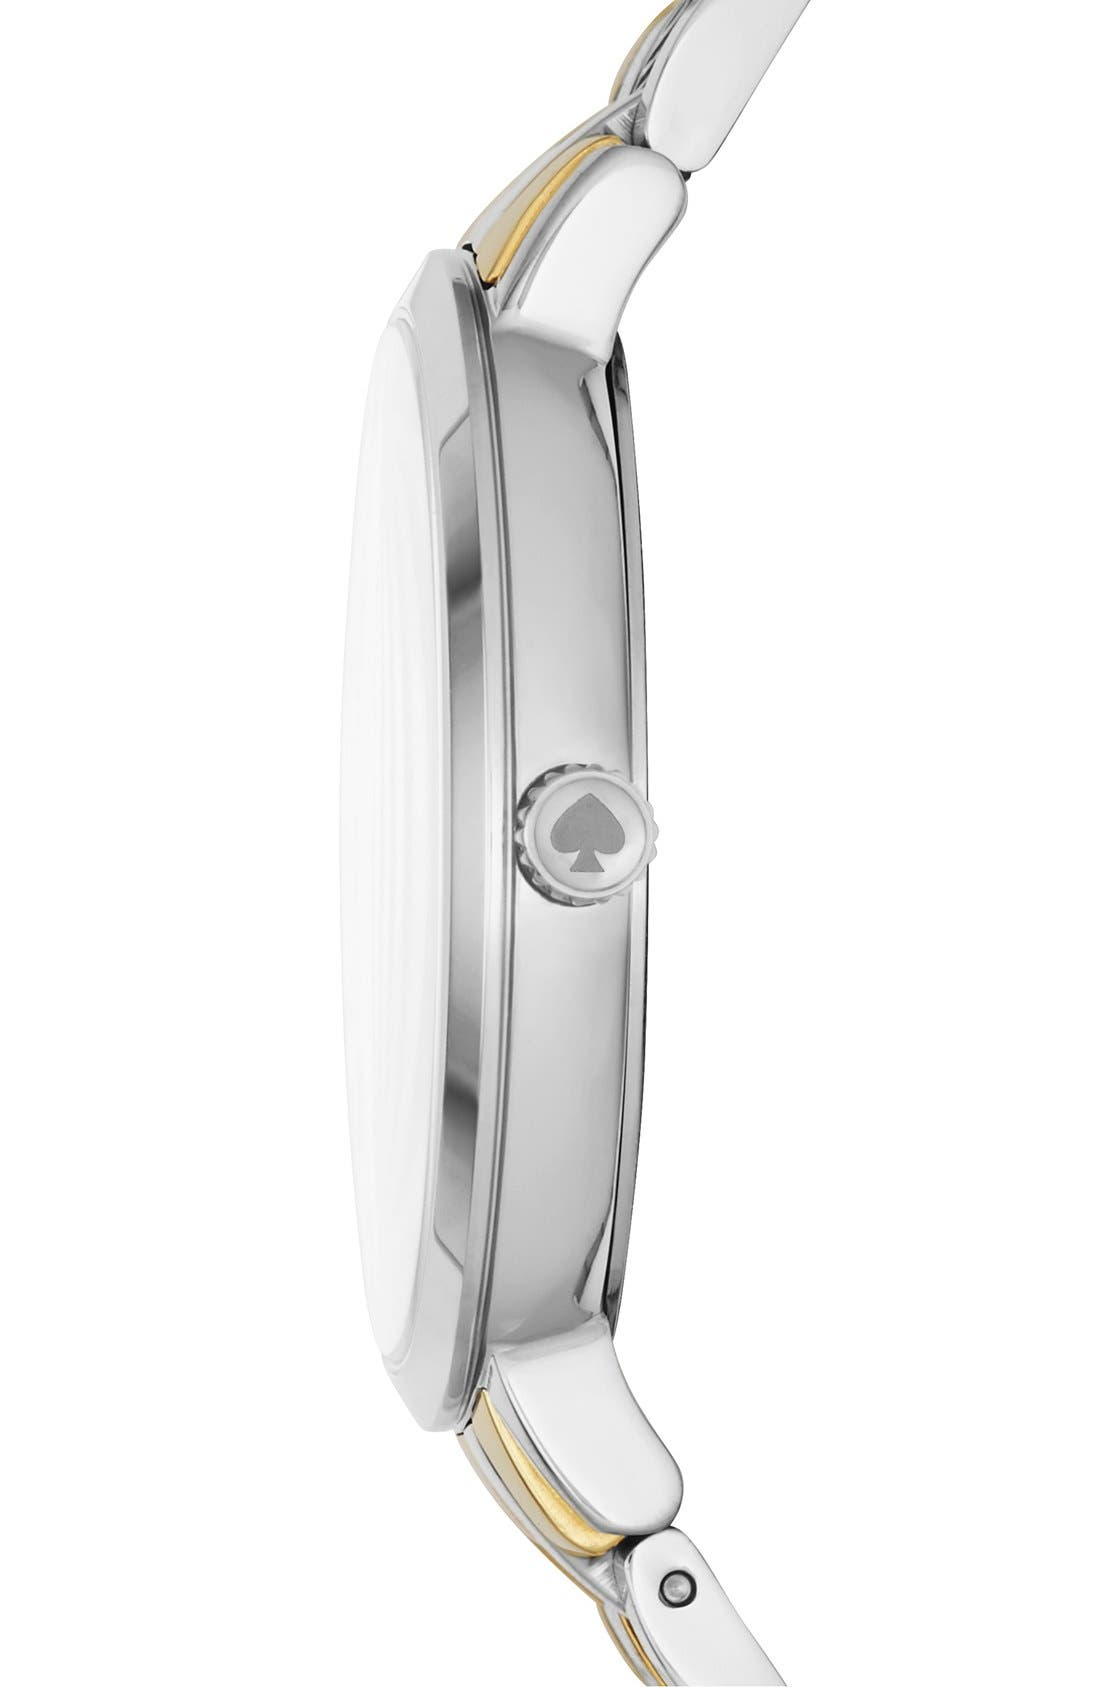 KATE SPADE NEW YORK,                             'monterey' bracelet watch, 38mm,                             Alternate thumbnail 3, color,                             040